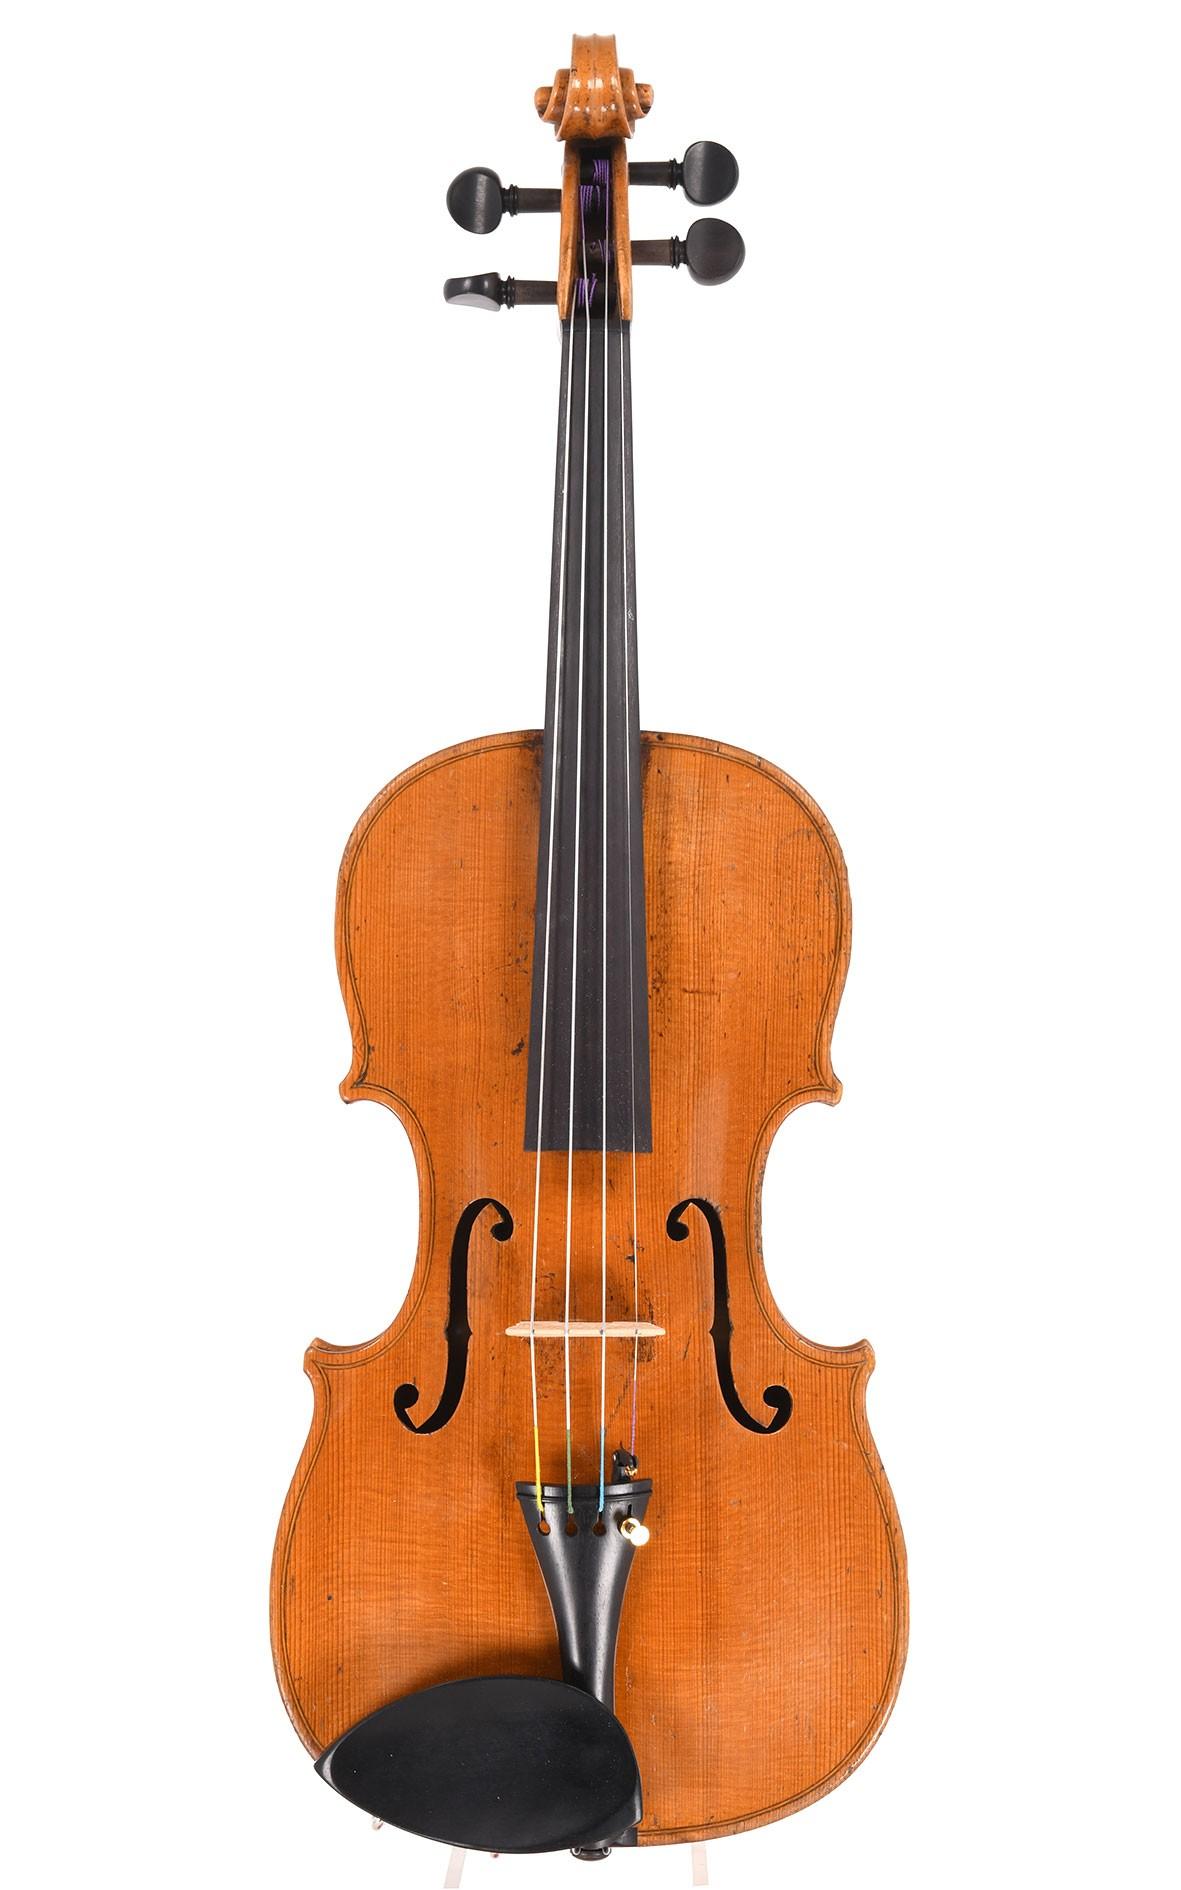 David Christian Hopf jun., vogtländische Geige